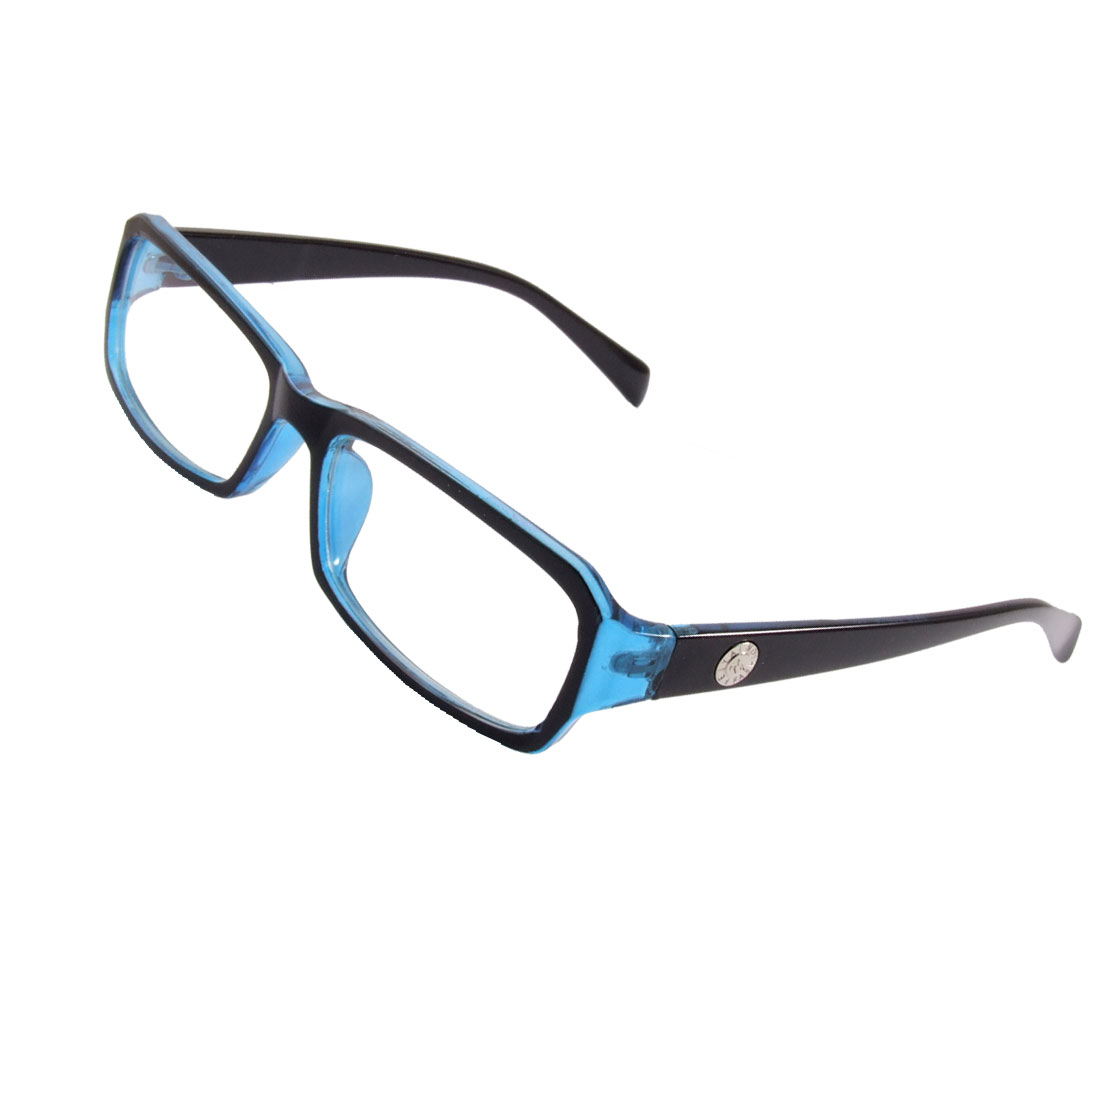 Lady Blue Black Plastic Rim Arms Multi Coated Lens Plain Glasses Eyeglasses